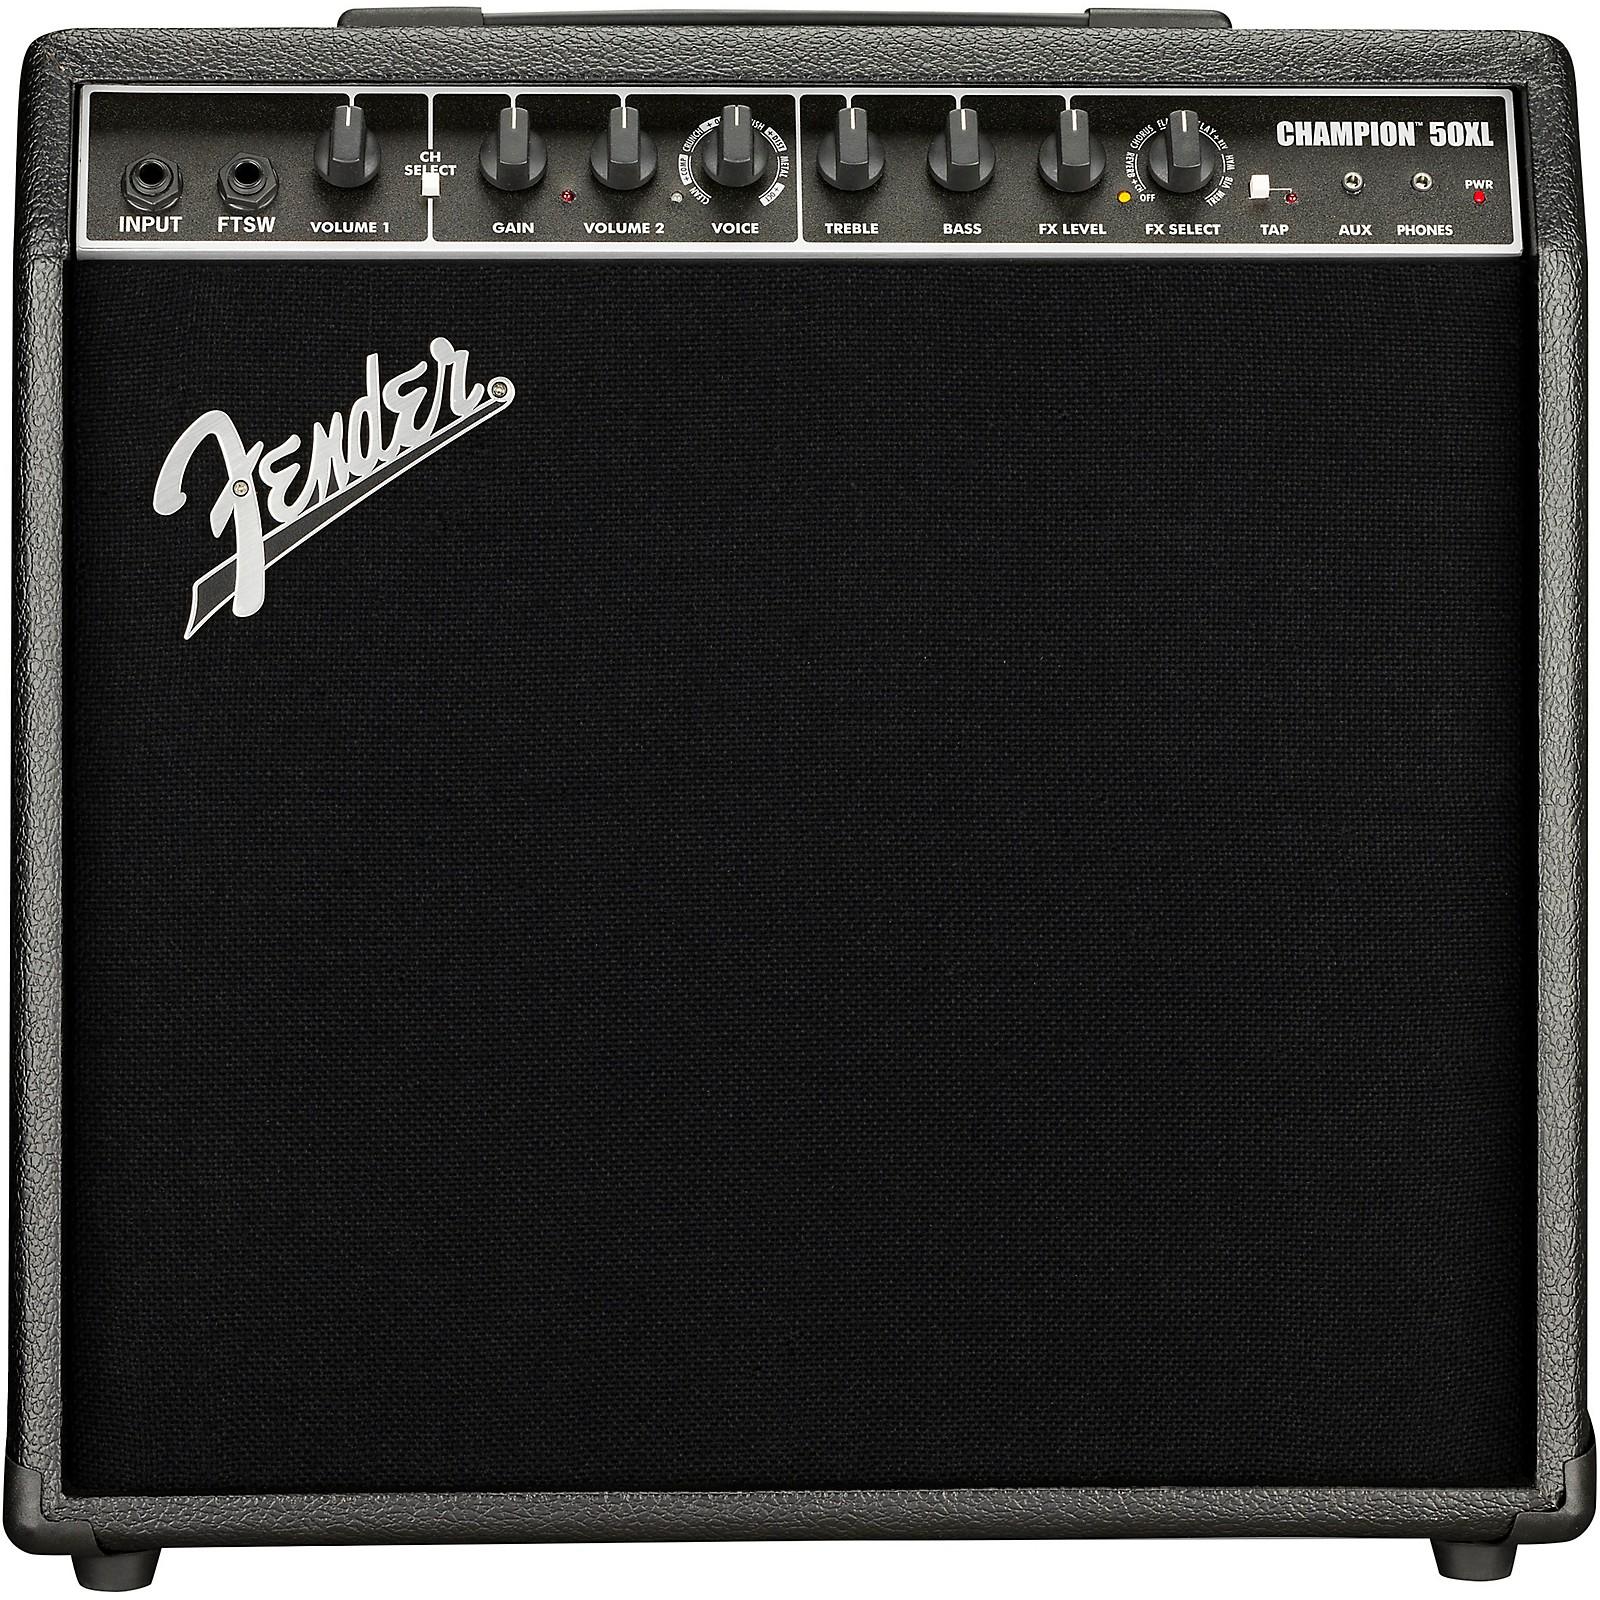 Fender Champion 50XL 50W 1x12 Guitar Combo Amp